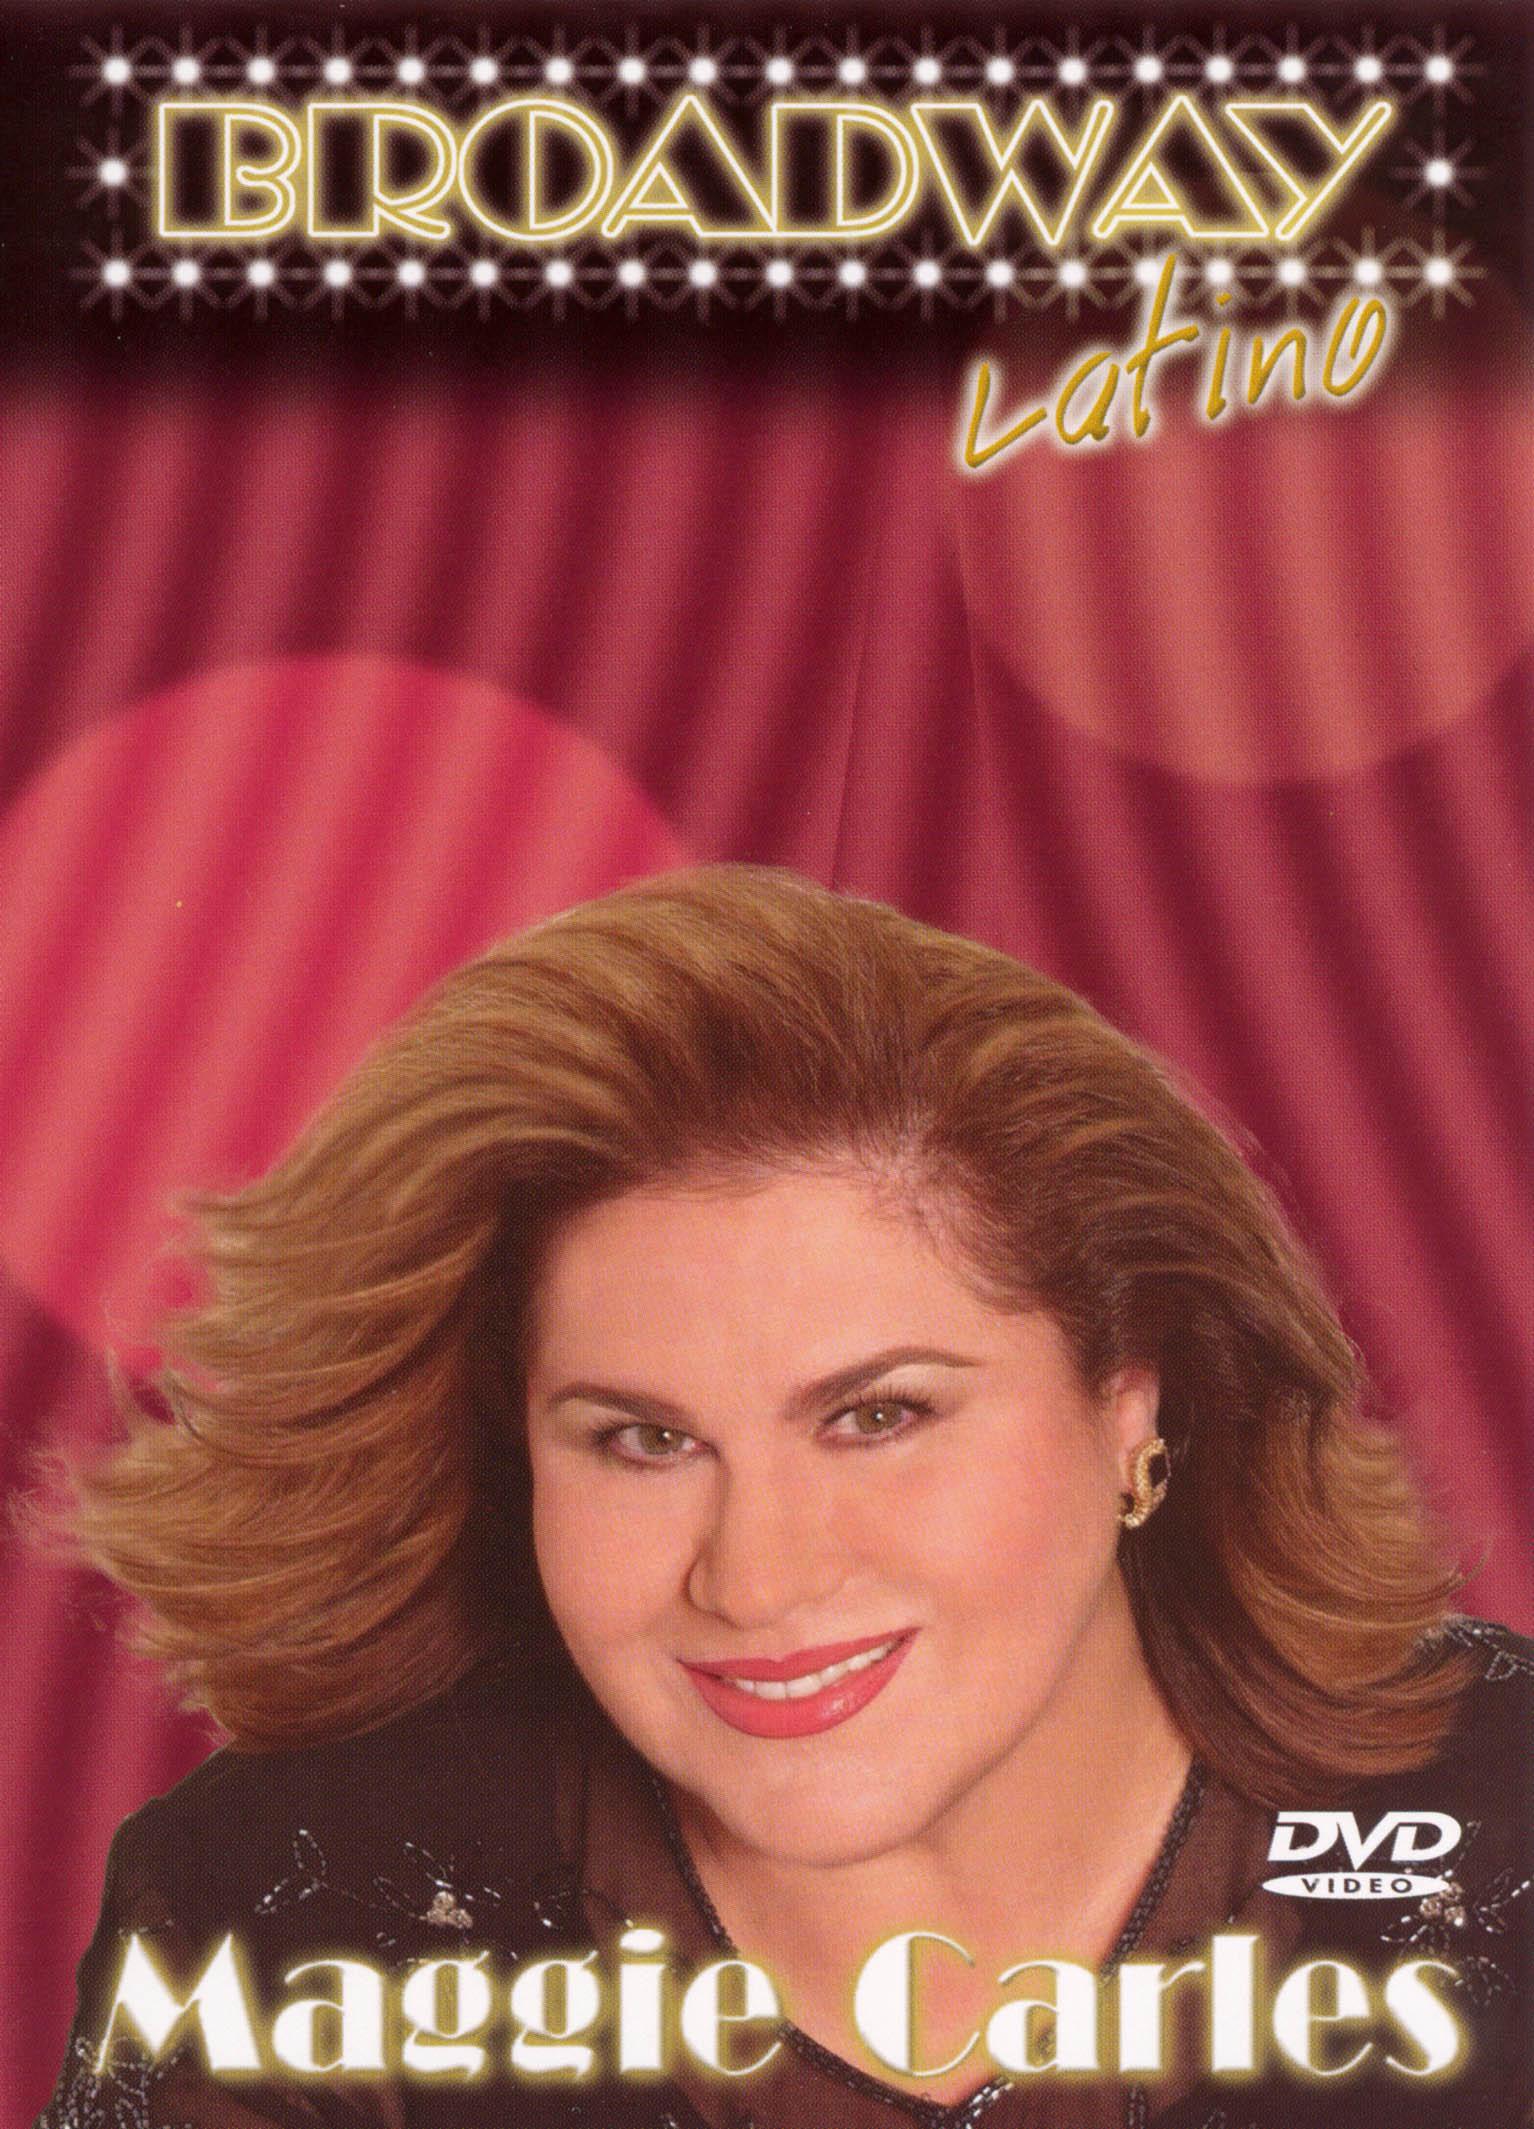 Maggie Carles: Broadway Latino